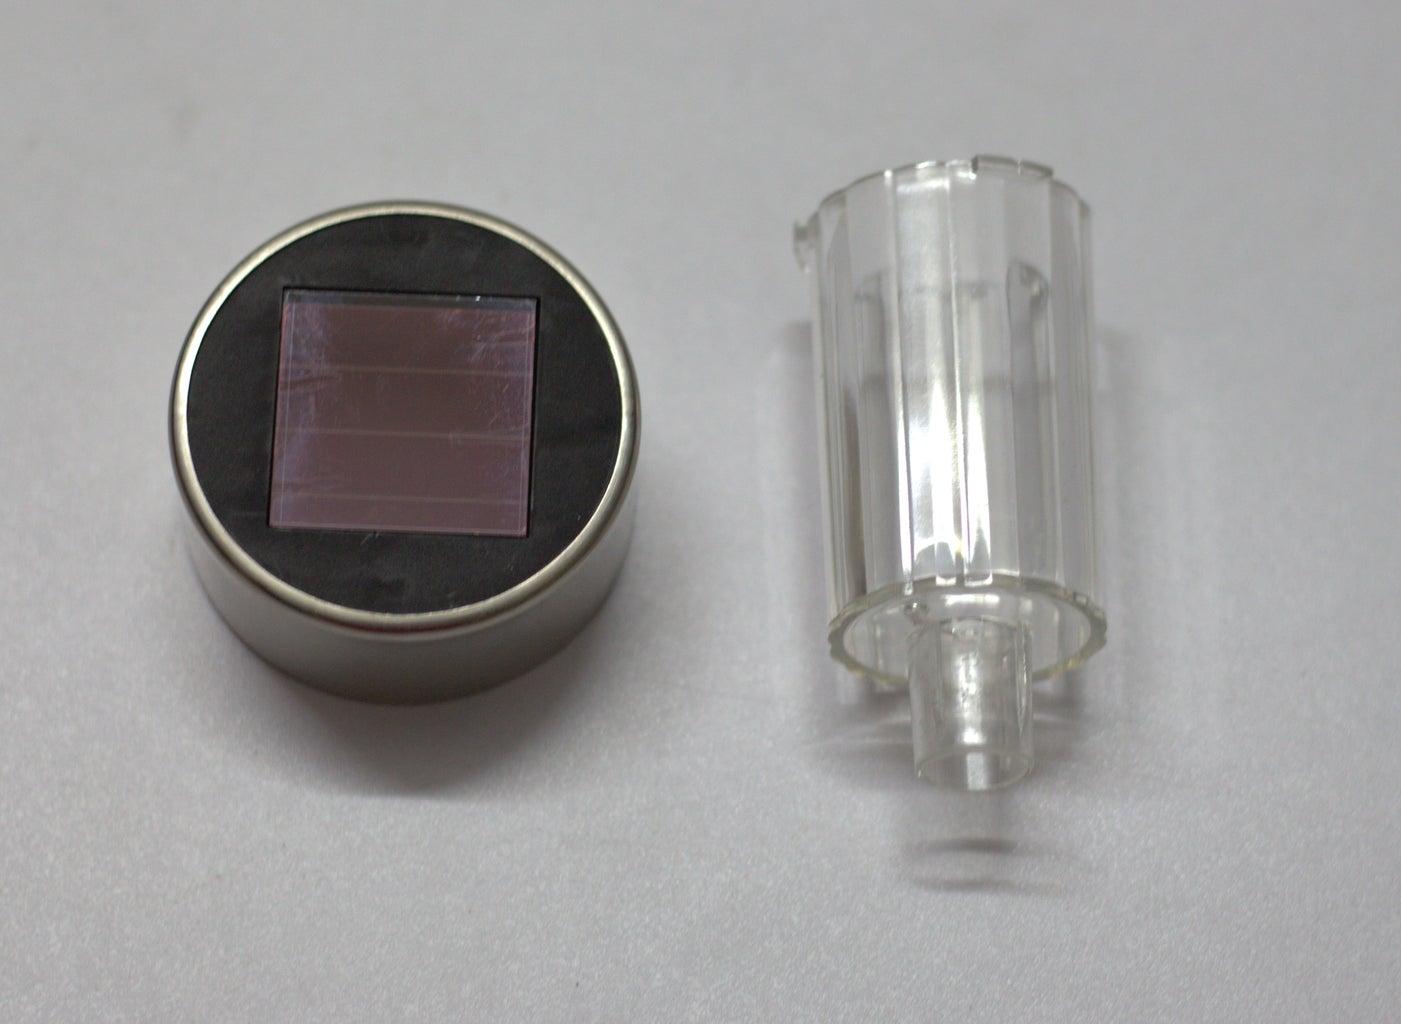 Separate the Solar Light